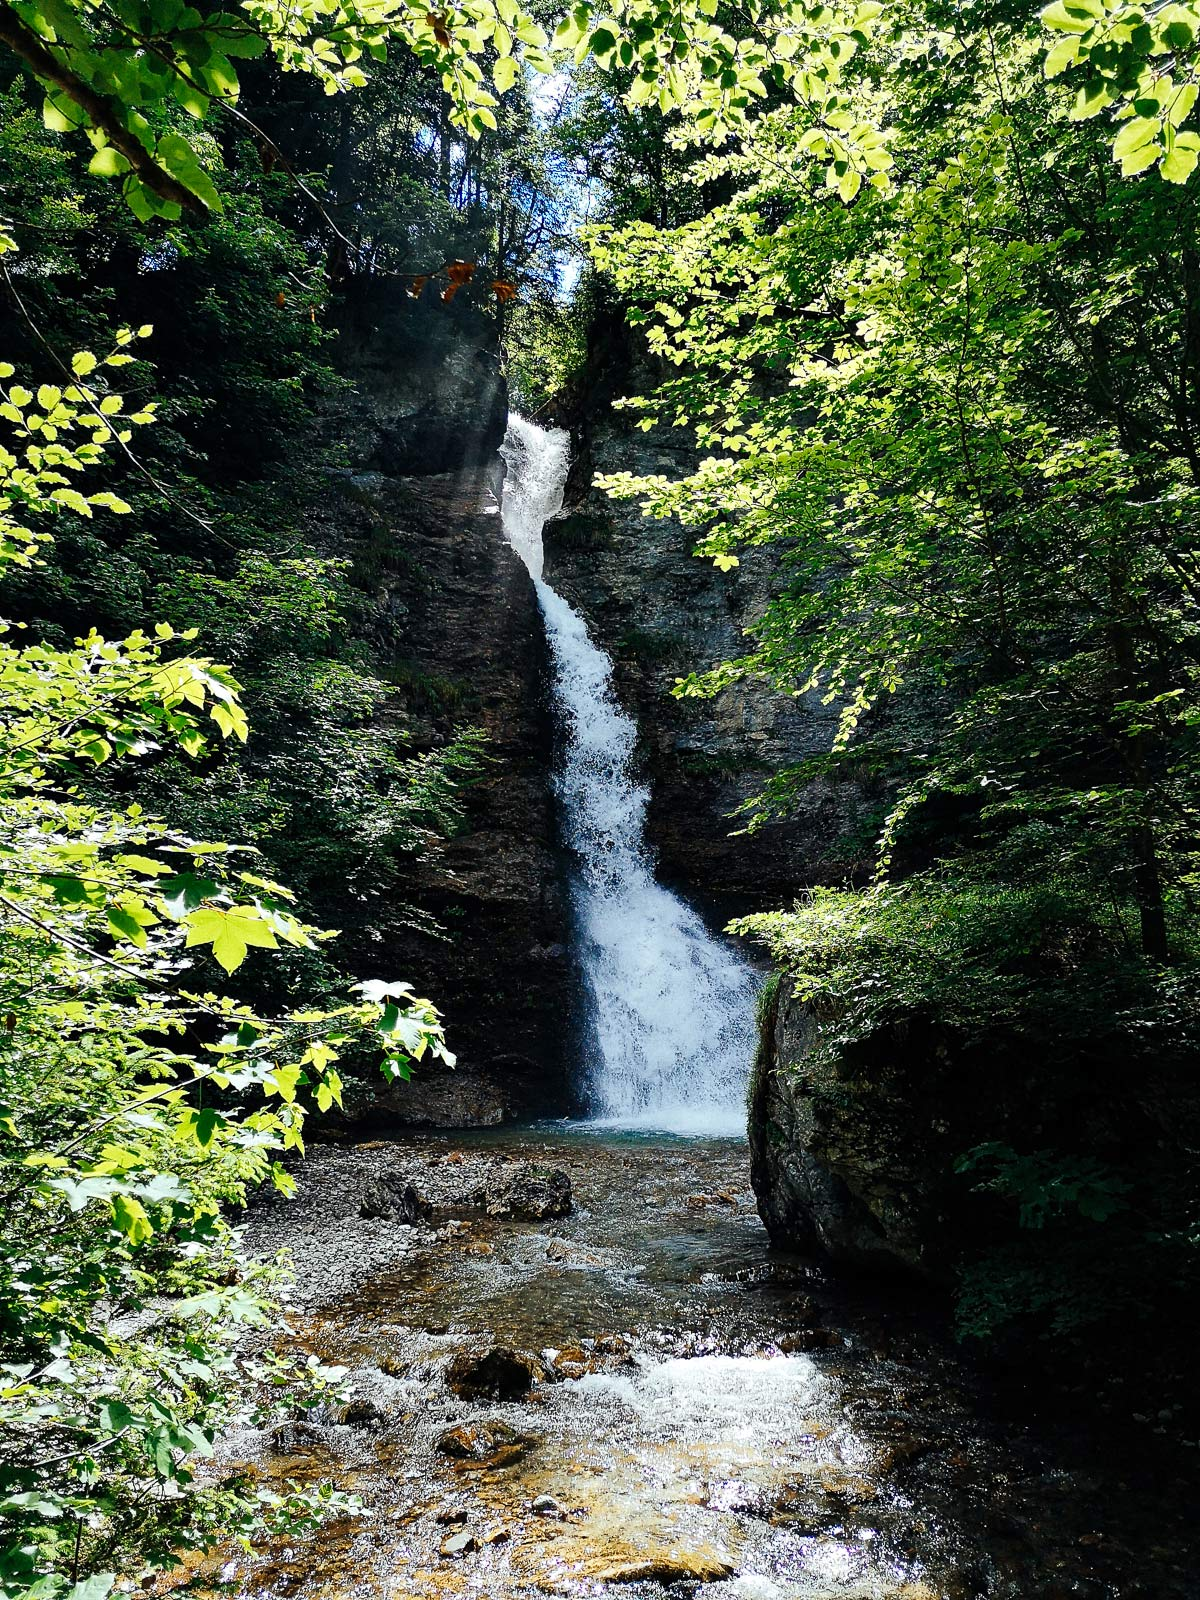 Wasserfall Wanderung zum Prinz Luitpold Haus